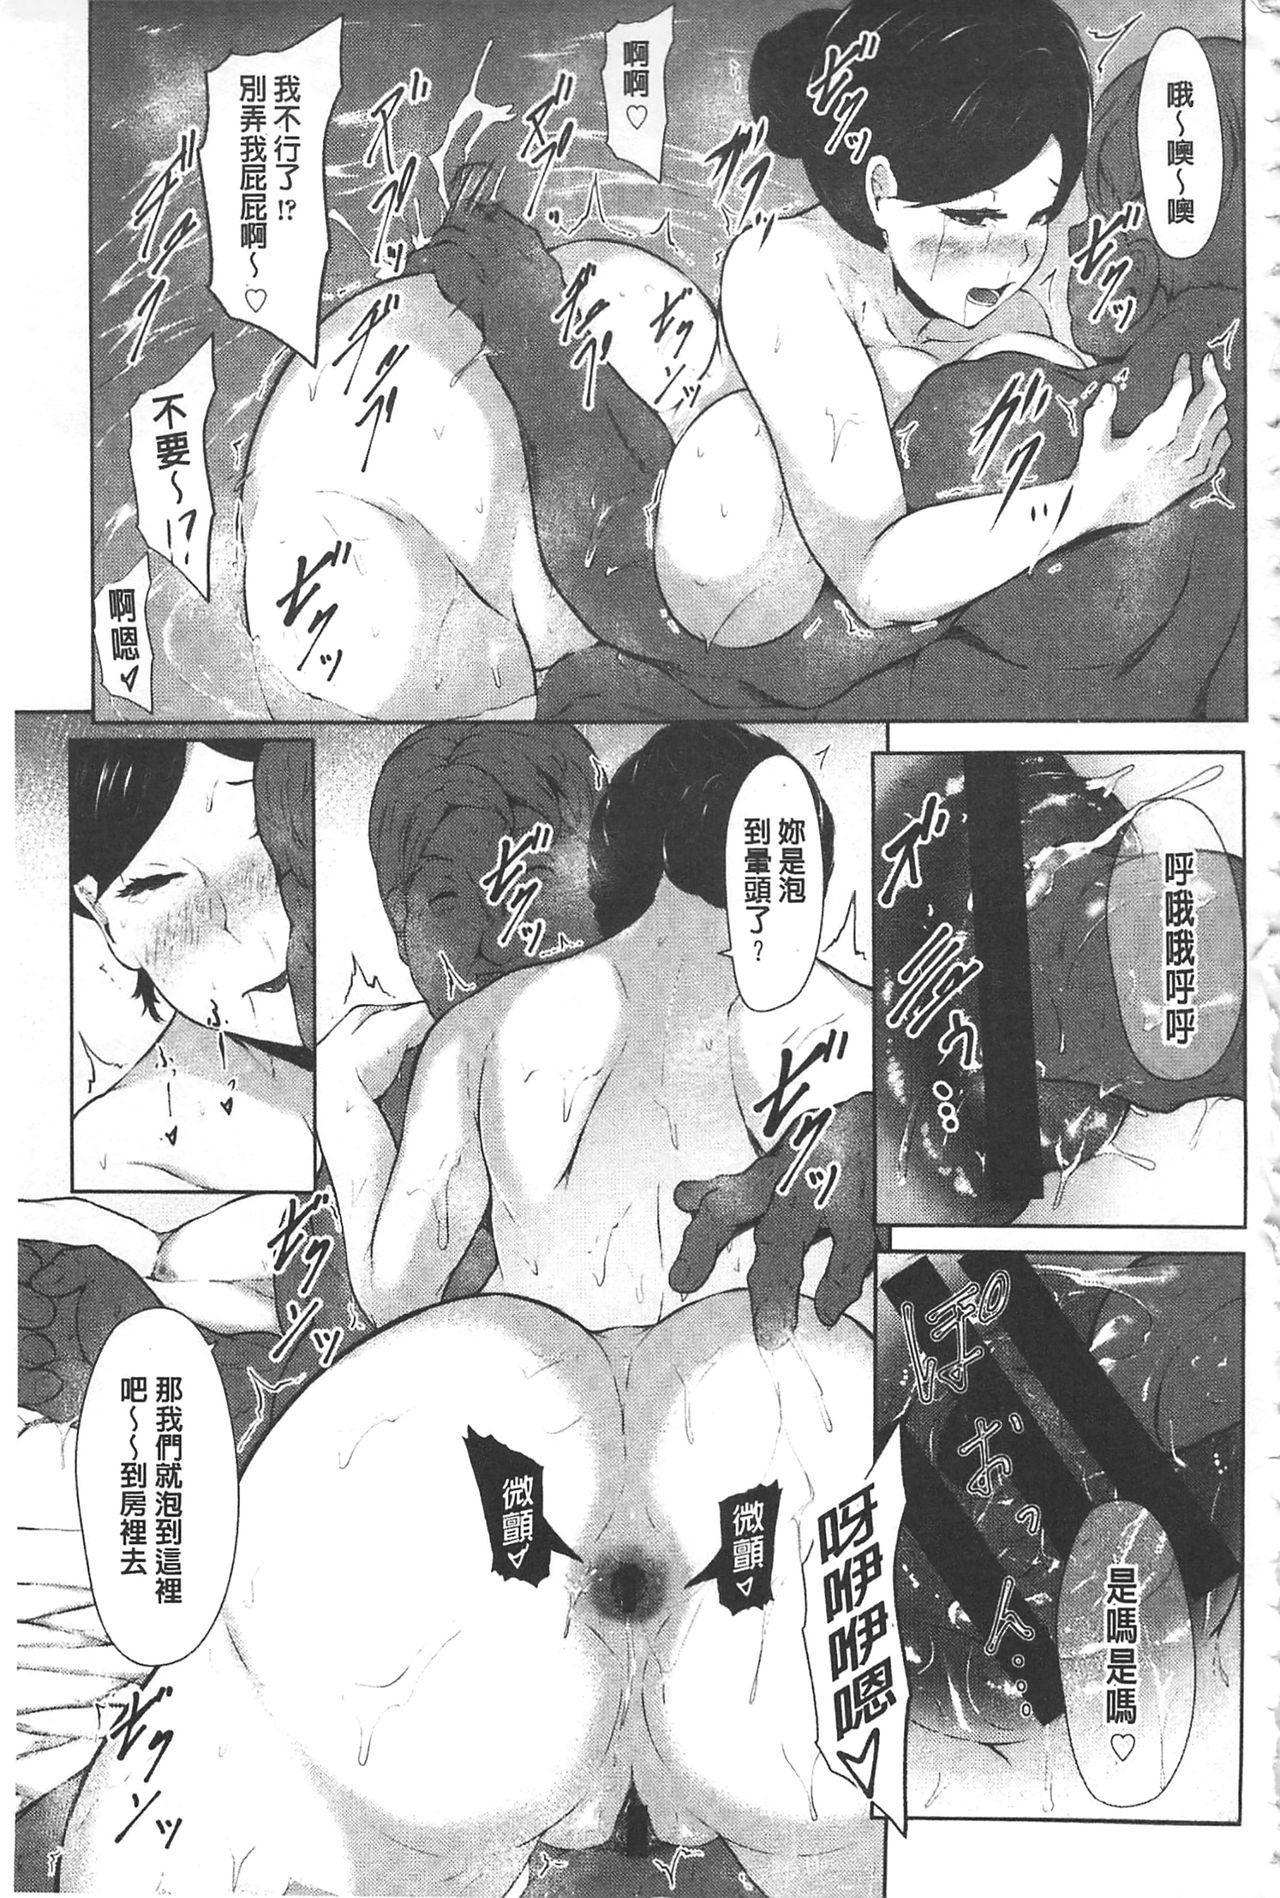 [Lorica] Biinkan Anal ~Kakusei Nejikomi Ana~ | 美淫感猥菊花 塞入擴張覺醒穴 [Chinese] 117